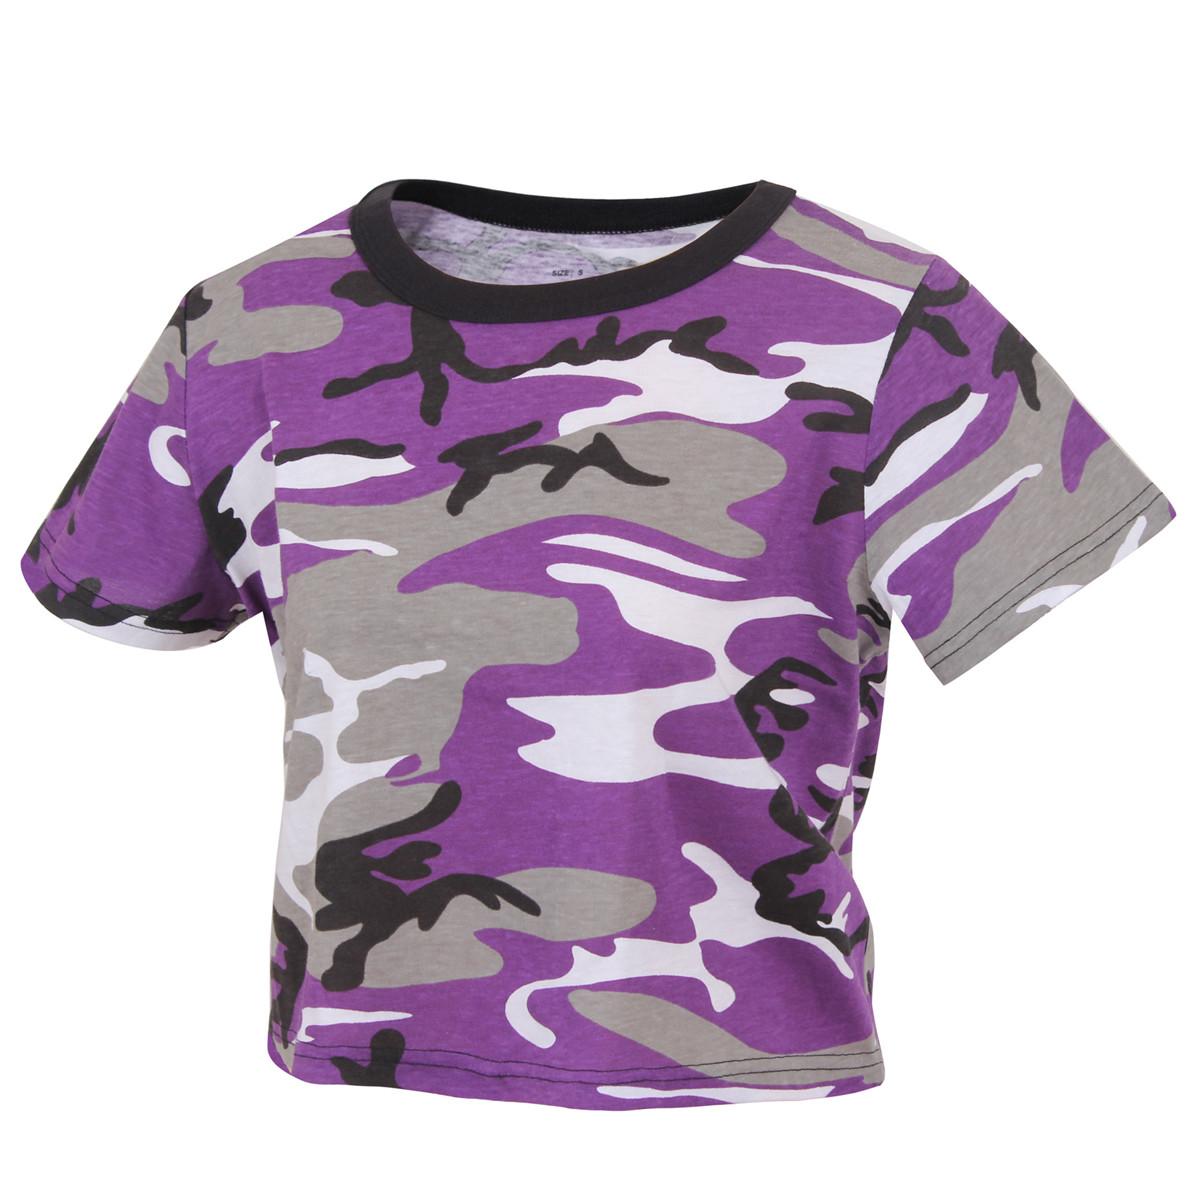 fb51da85417c31 Shop Womens Crop Purple Camo T s - Fatigues Army Navy Gear